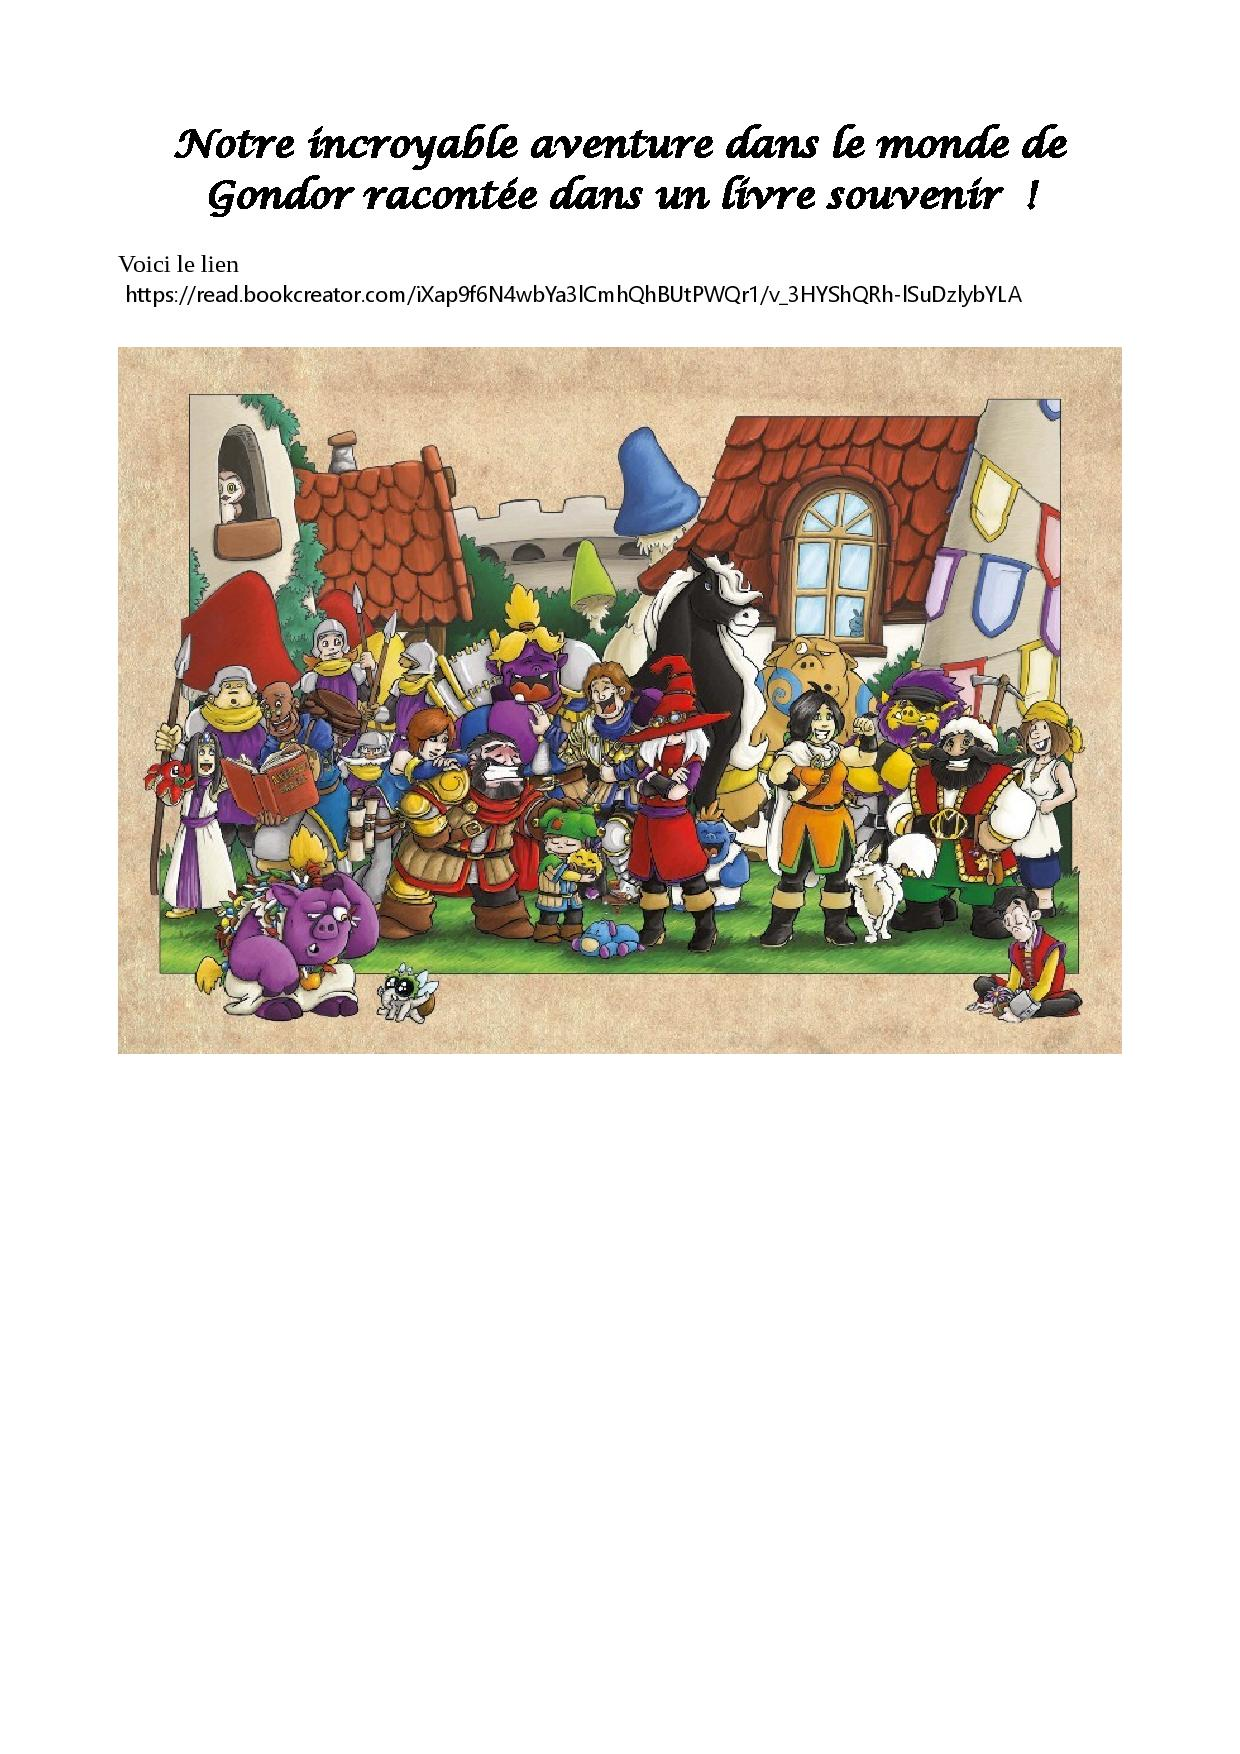 gondor site-page-001